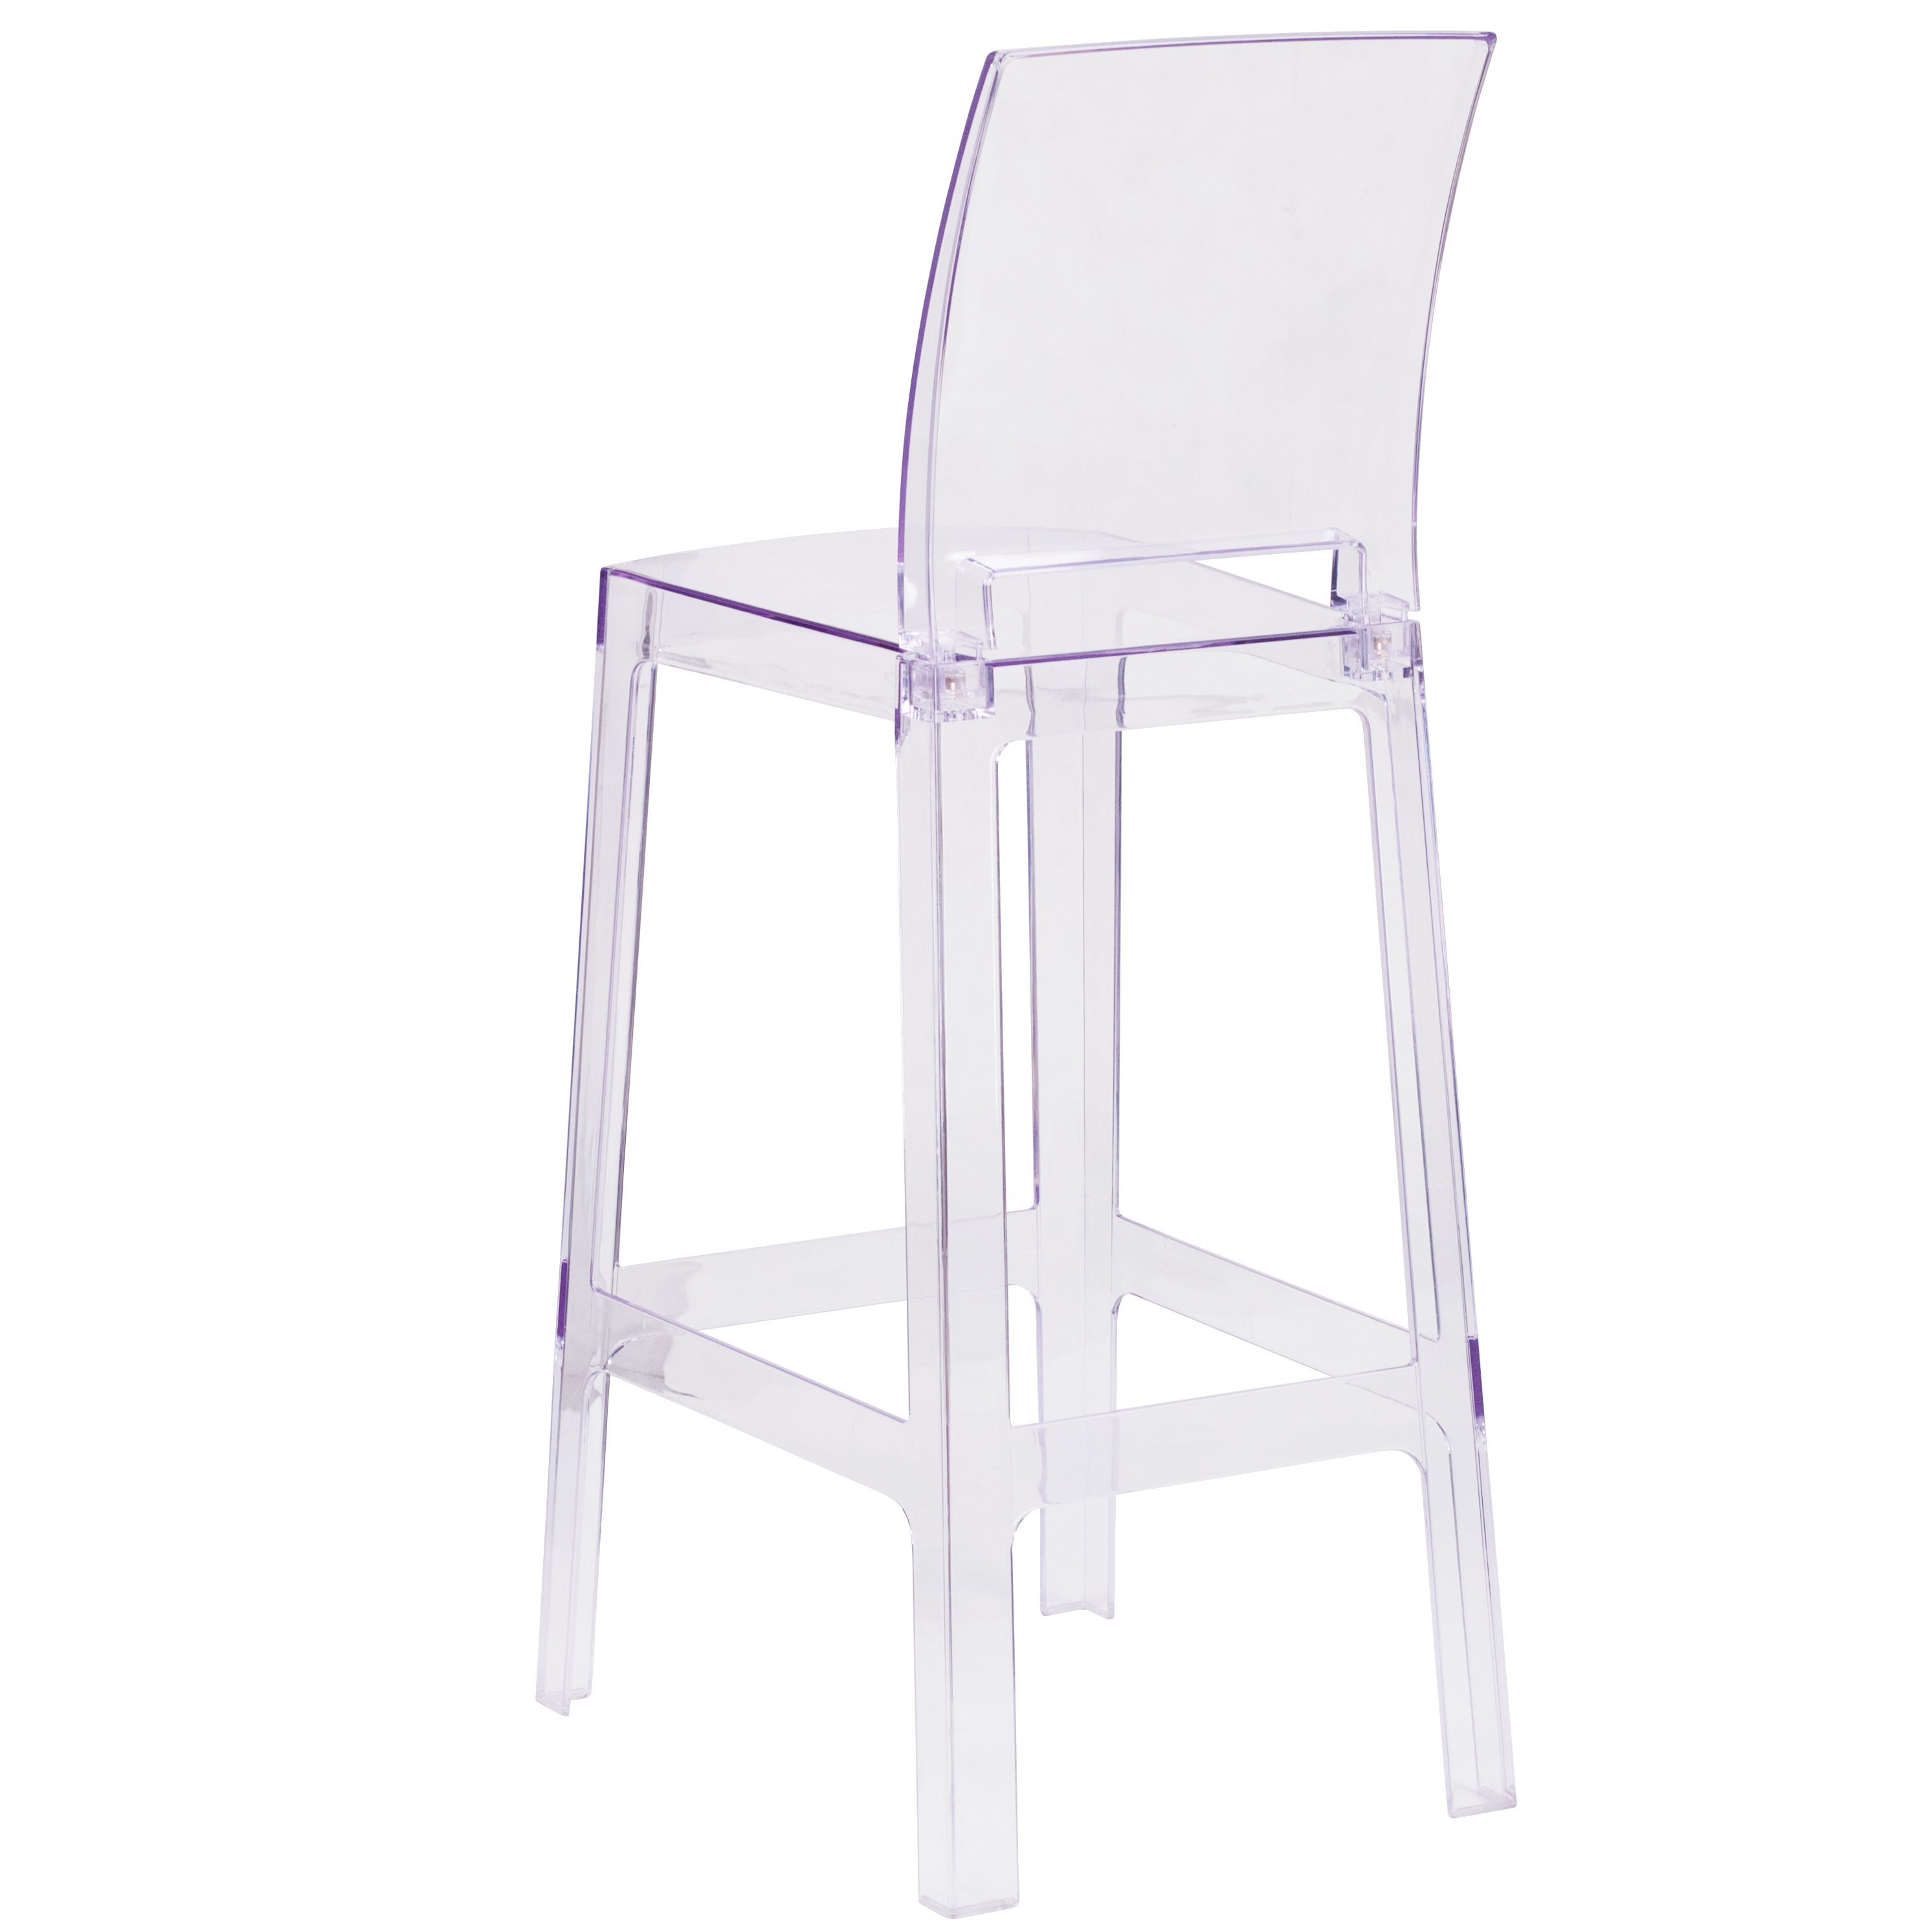 stool chair rentals balance ball office reviews la marie bar rental event trade show